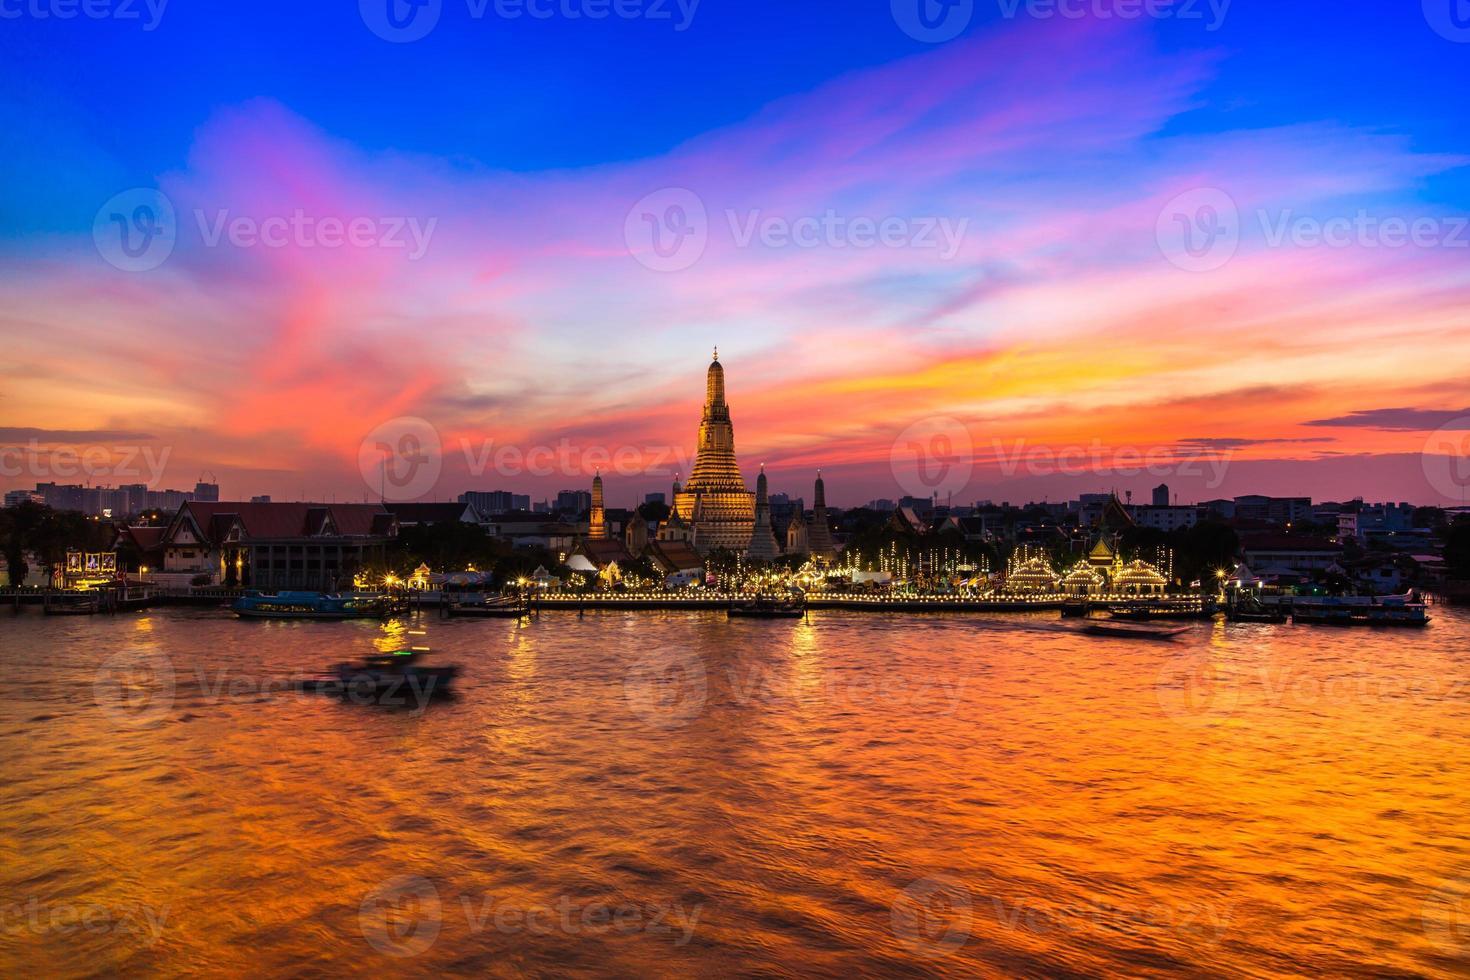 Bangkok, Thailand, 2020 - Blick auf den Wat Arun Tempel bei Sonnenuntergang foto